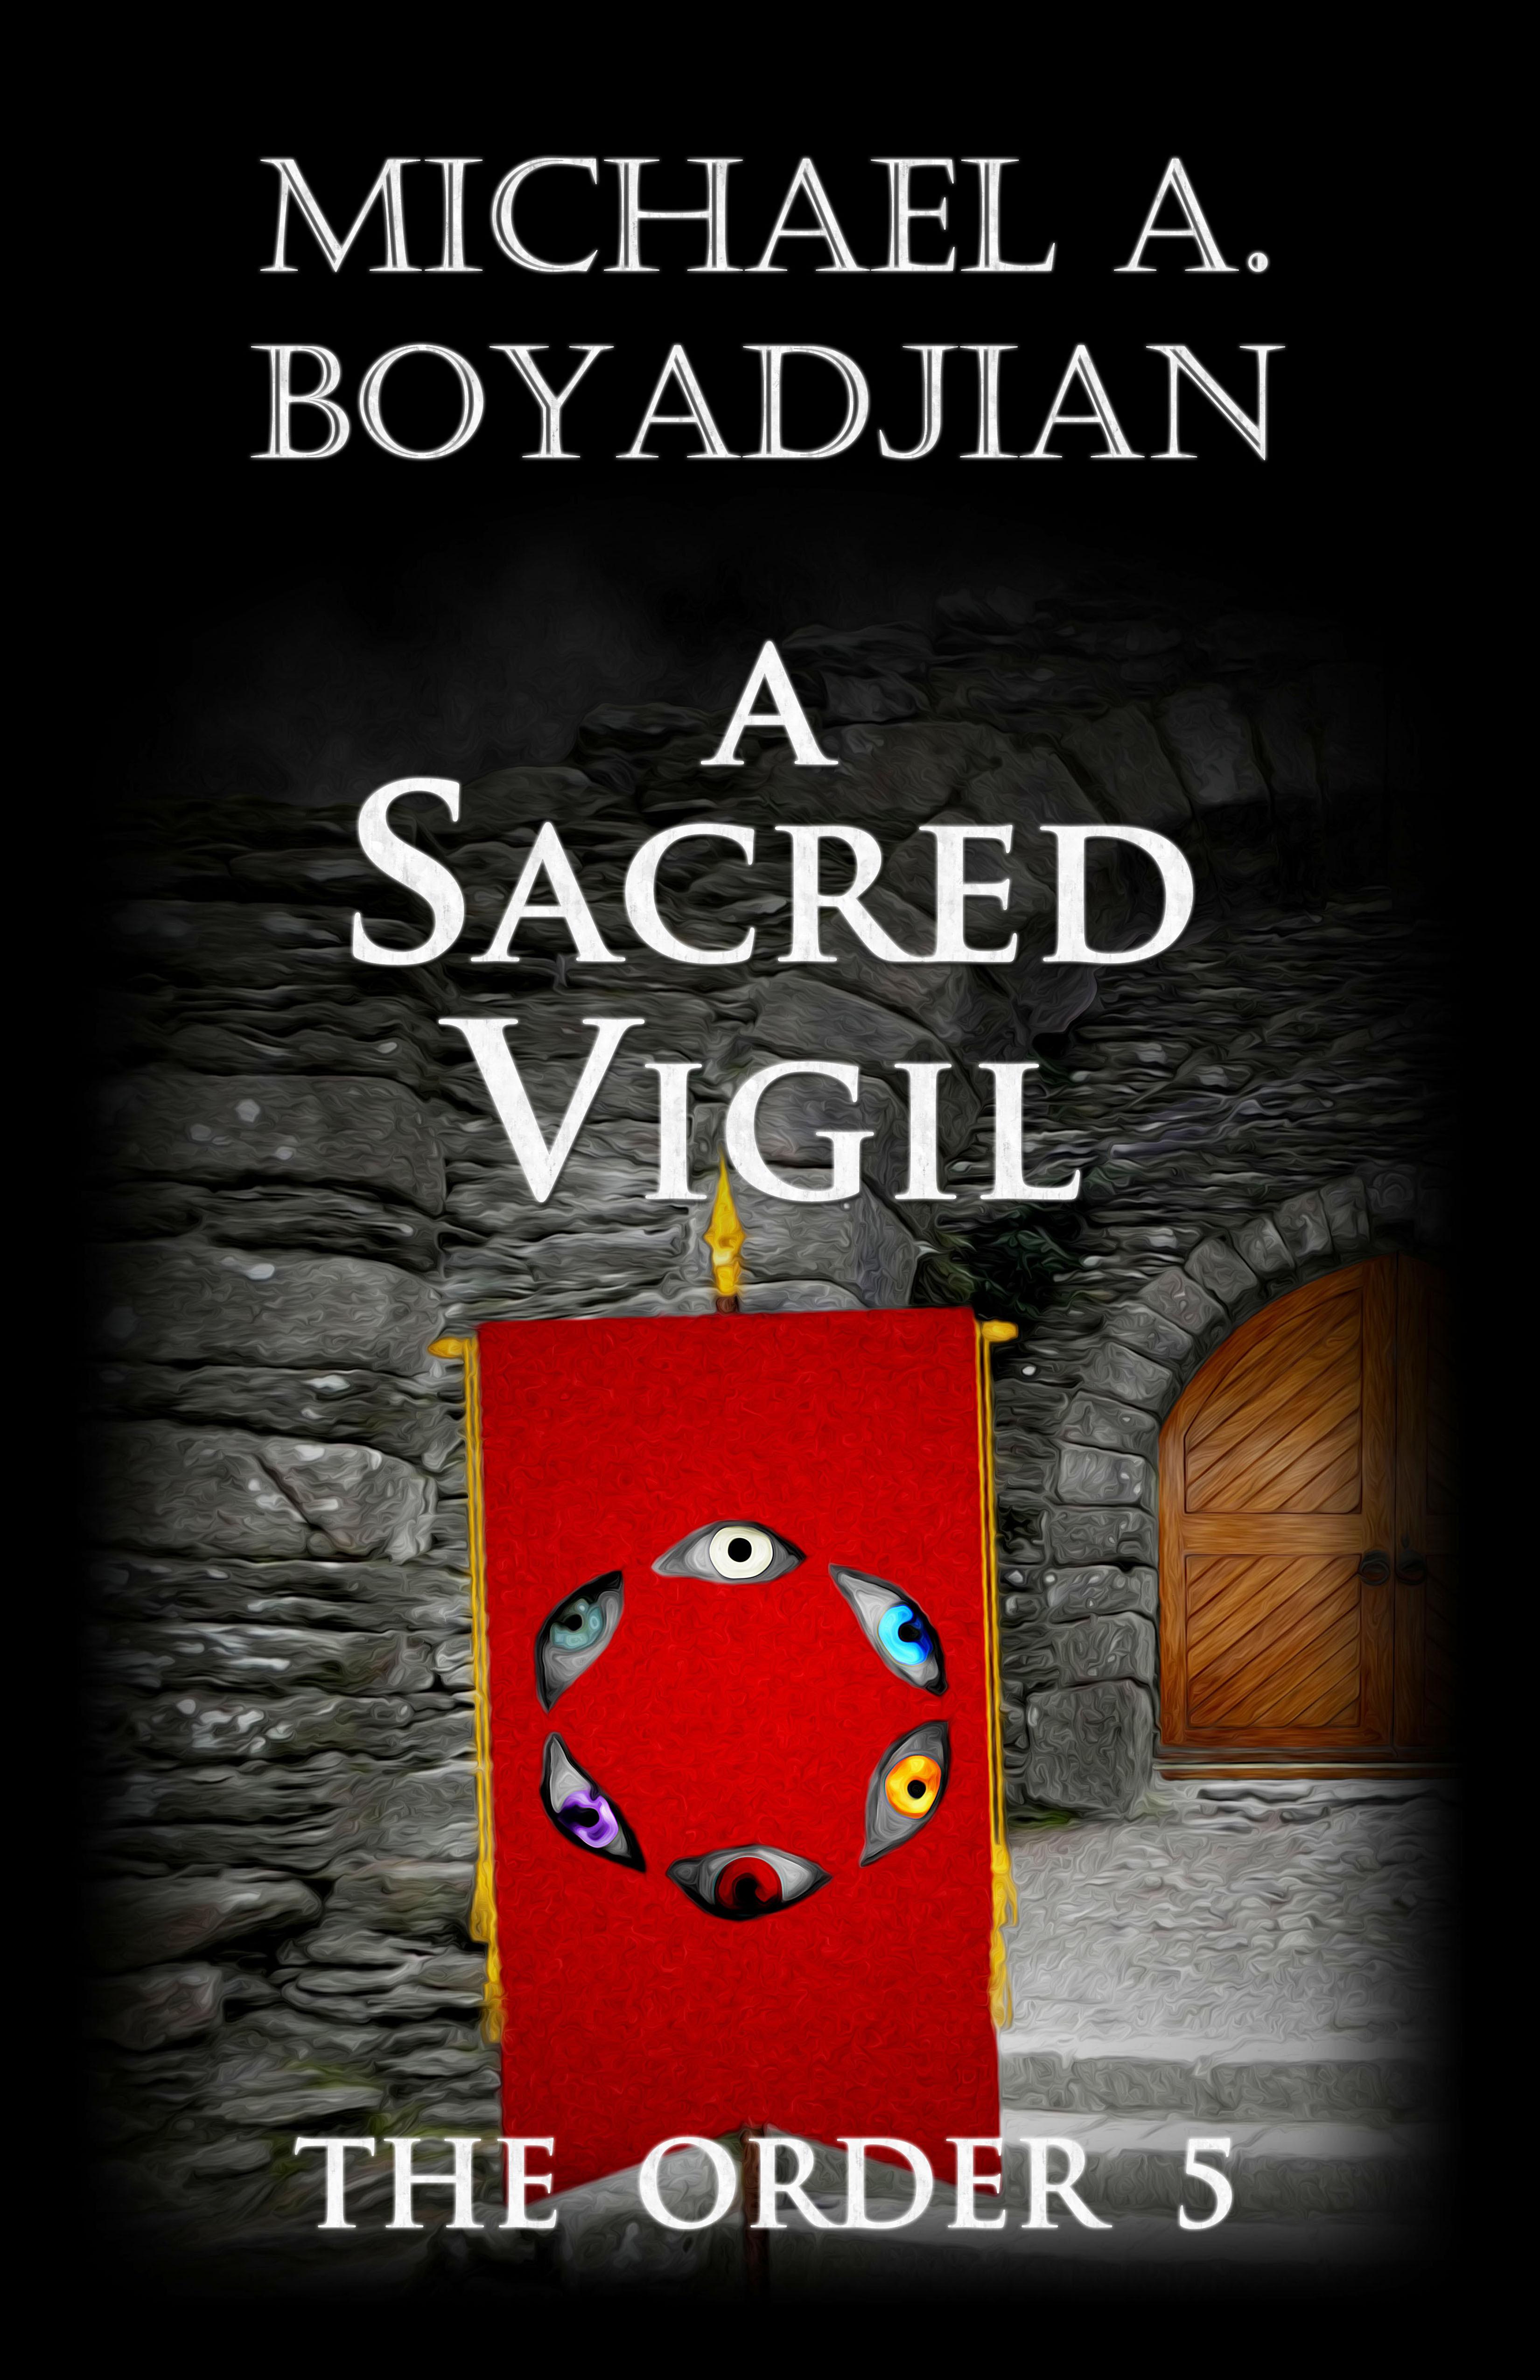 A Sacred Vigil  by  Michael A. Boyadjian